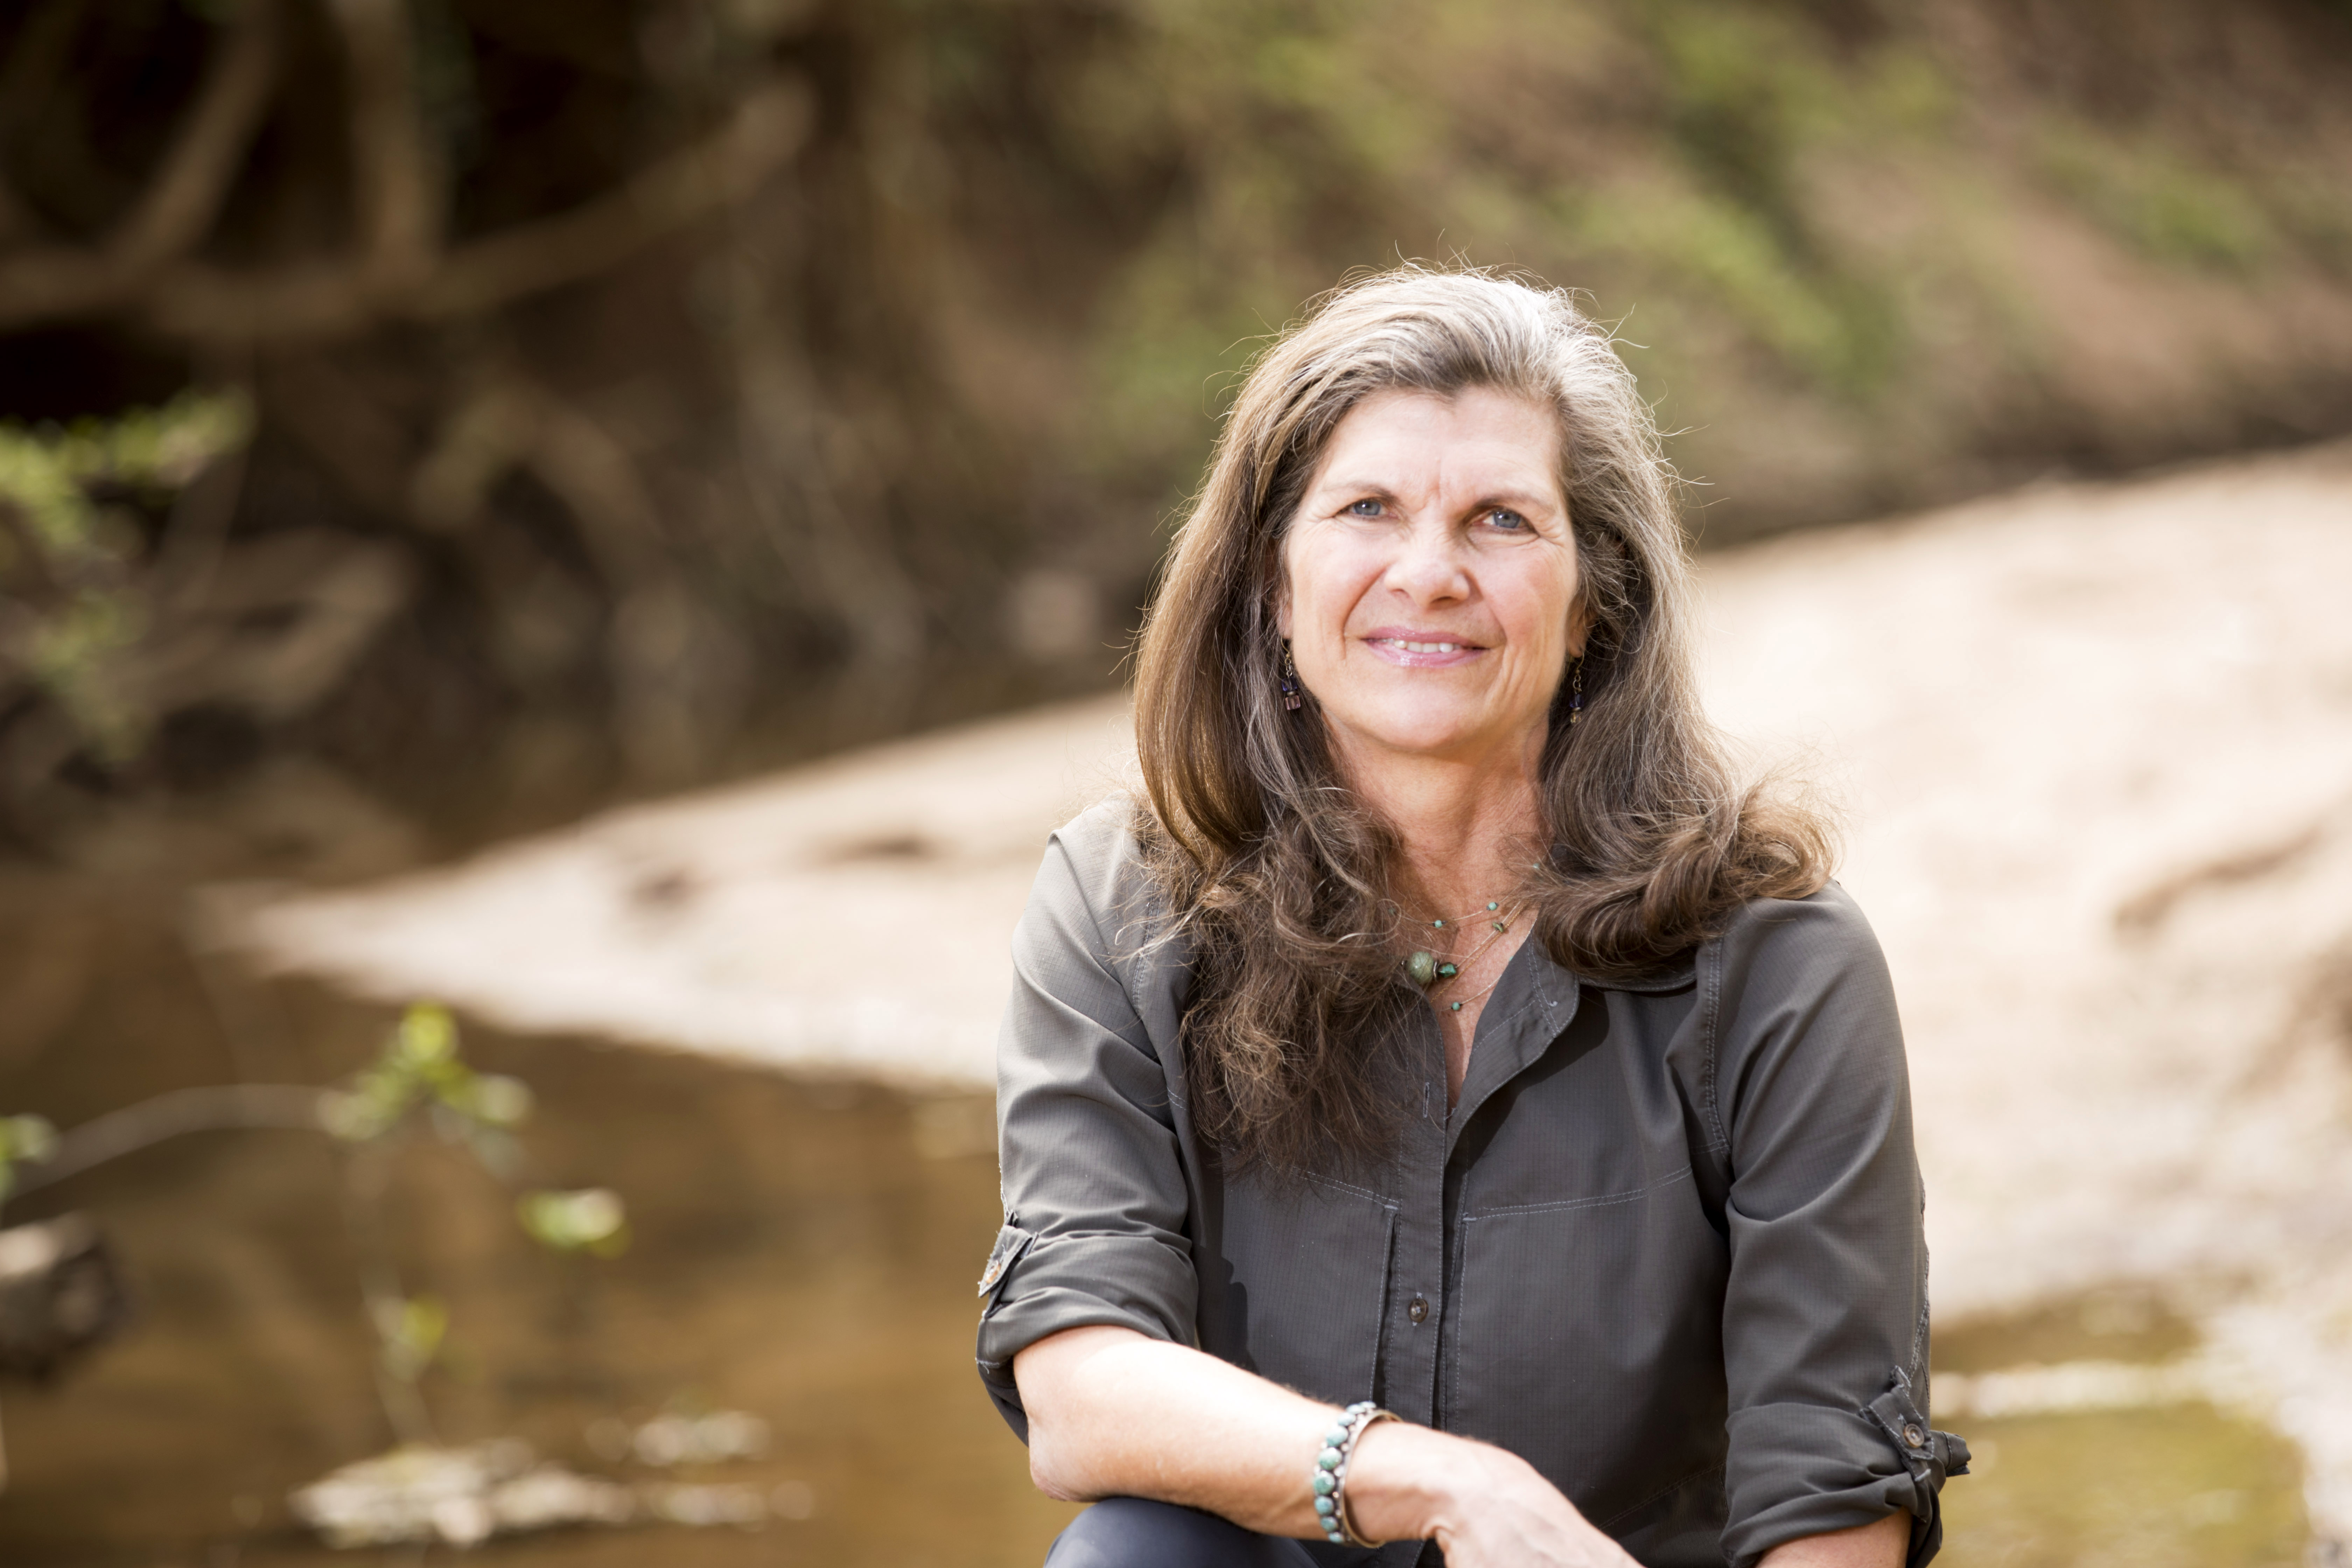 Rosemond wins 2018 Creative Research Medal